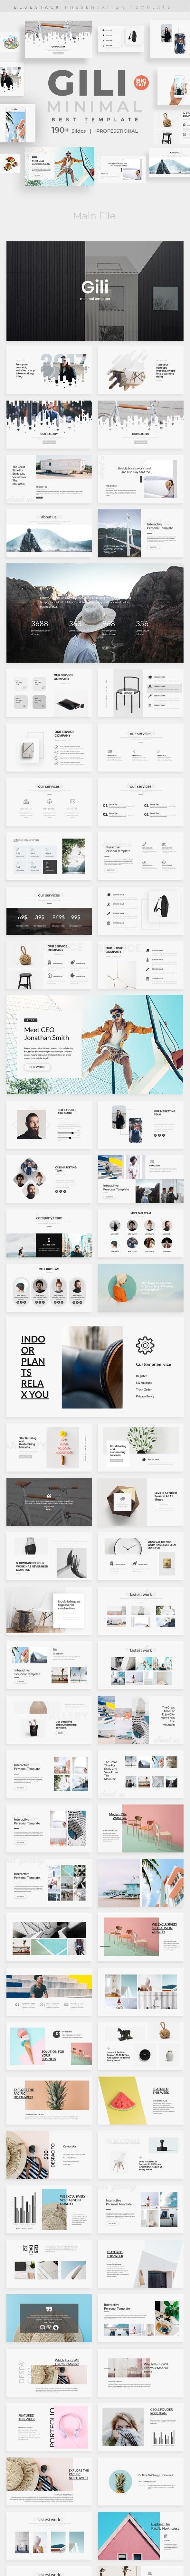 Gili Minimal Design Powerpoint Template - Creative PowerPoint Templates